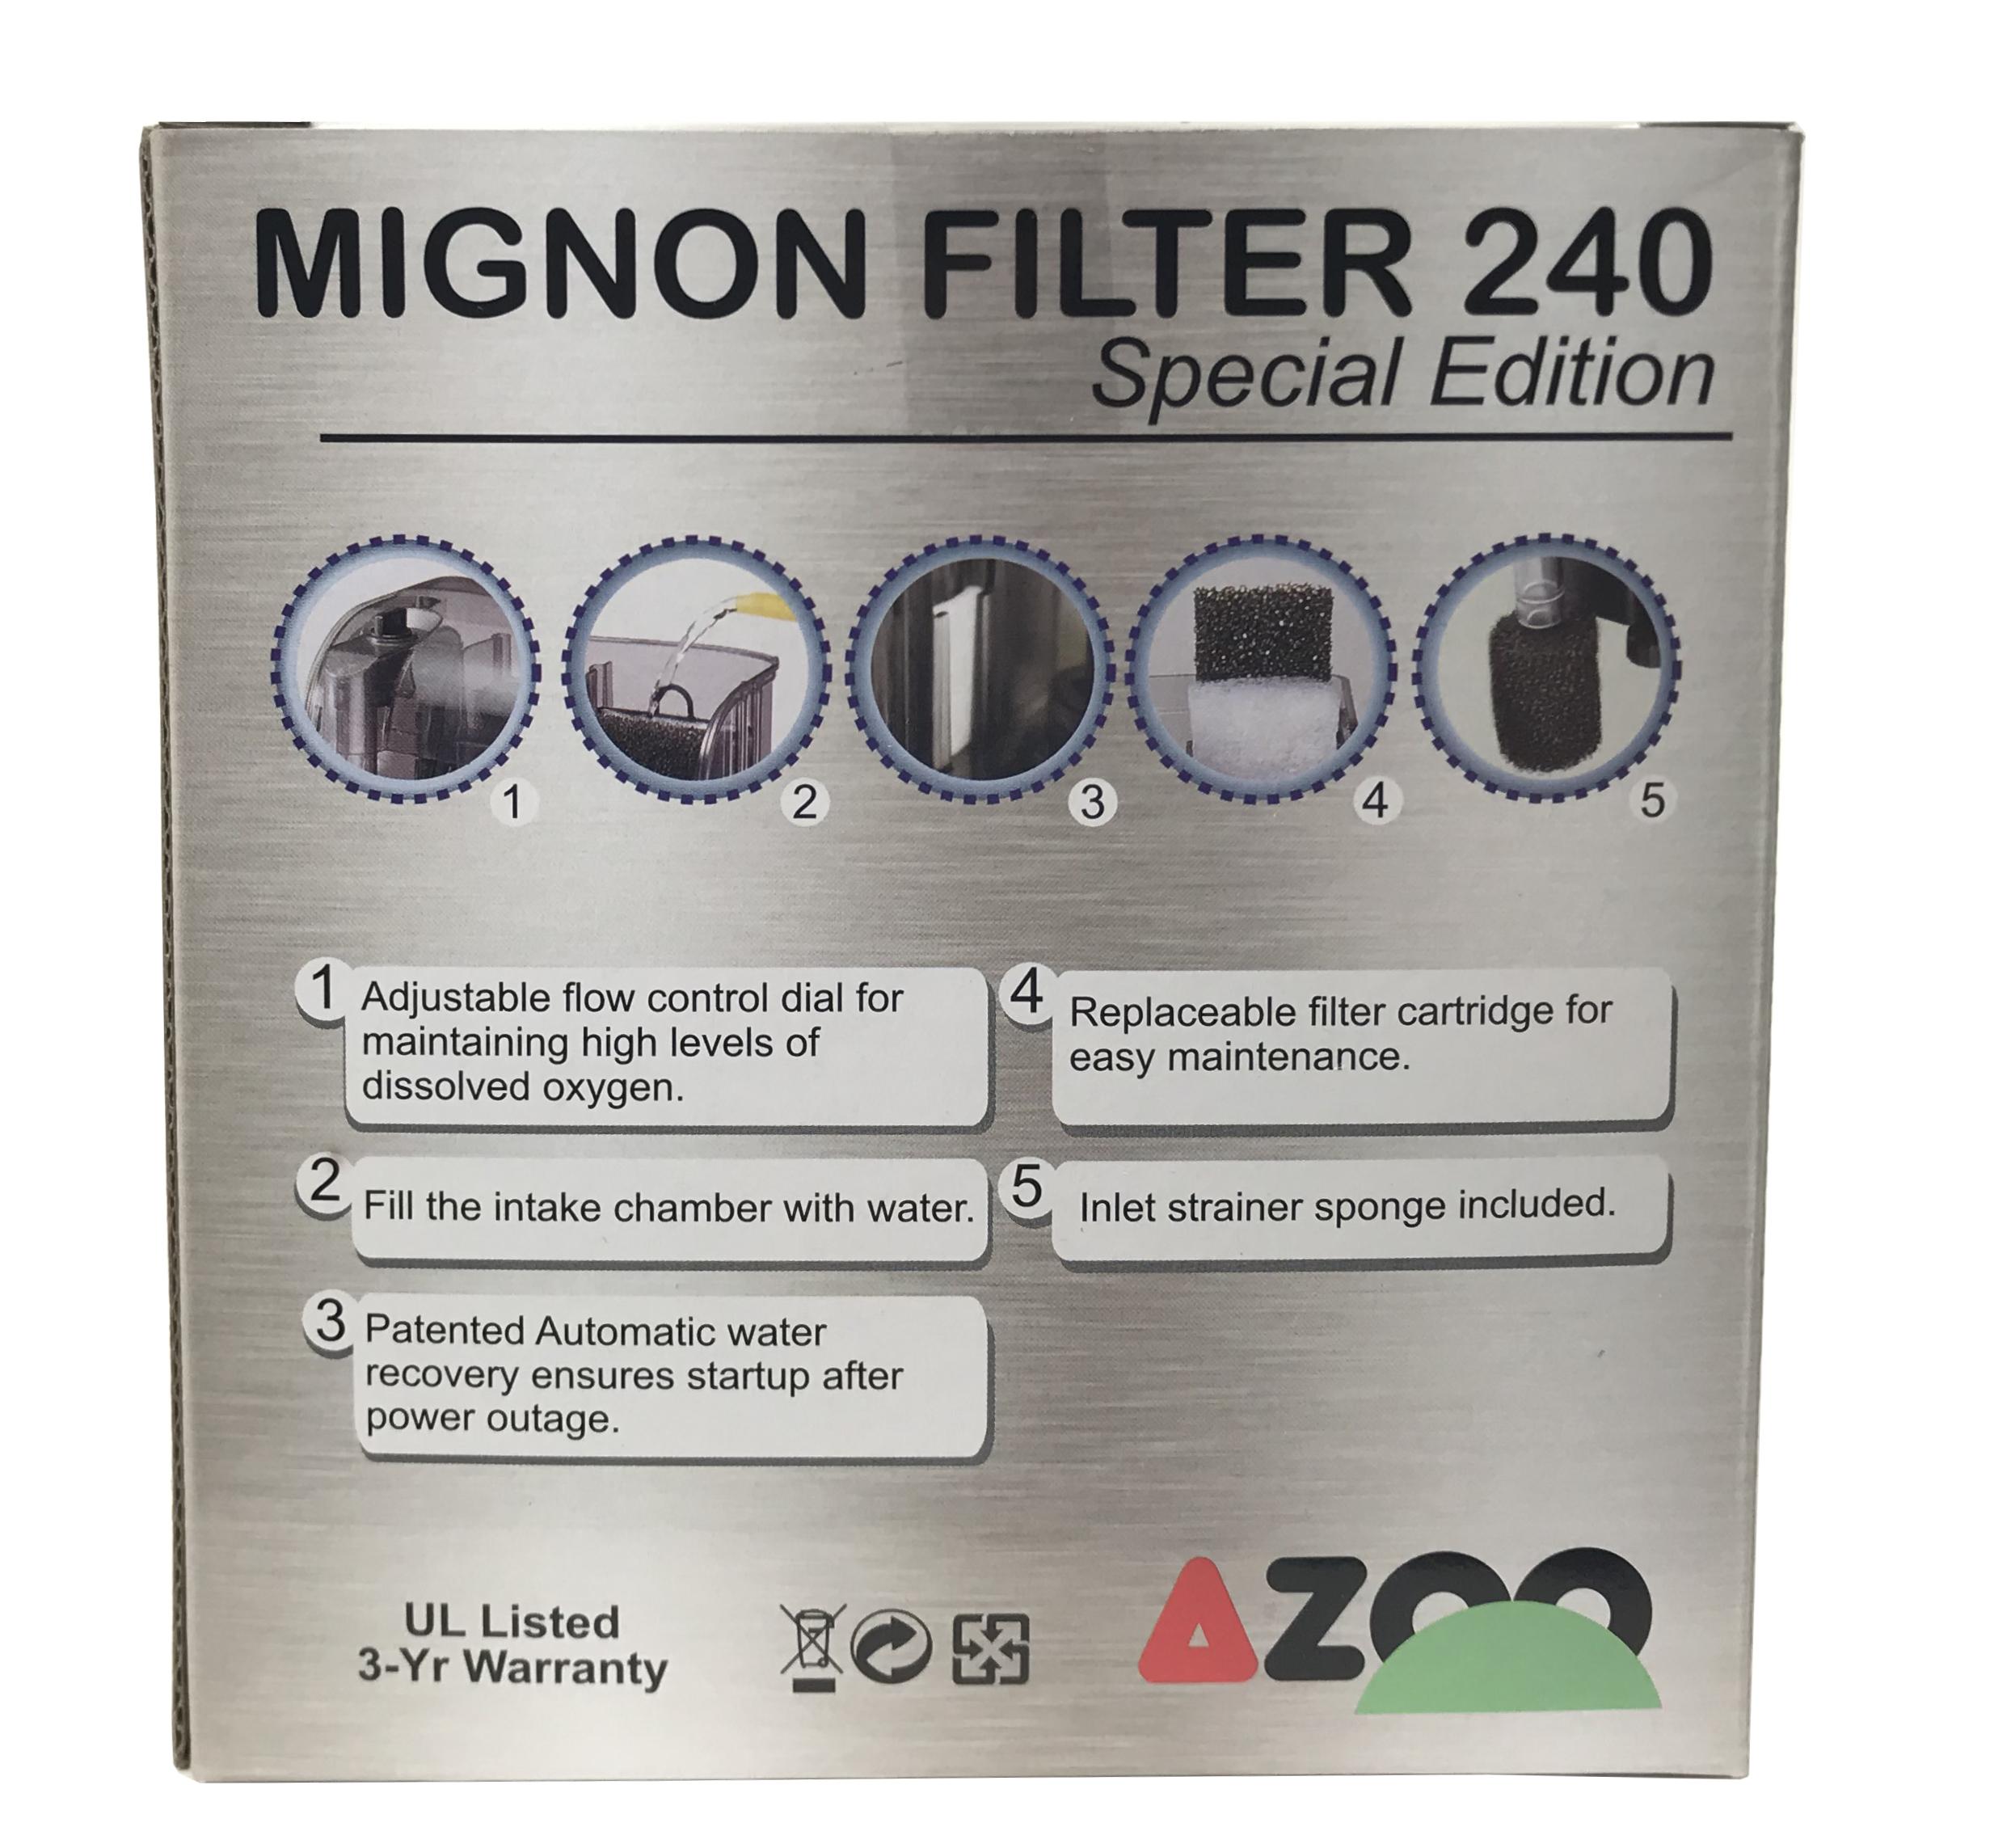 Mignon Filter 240 Special Edition - 64 GPH